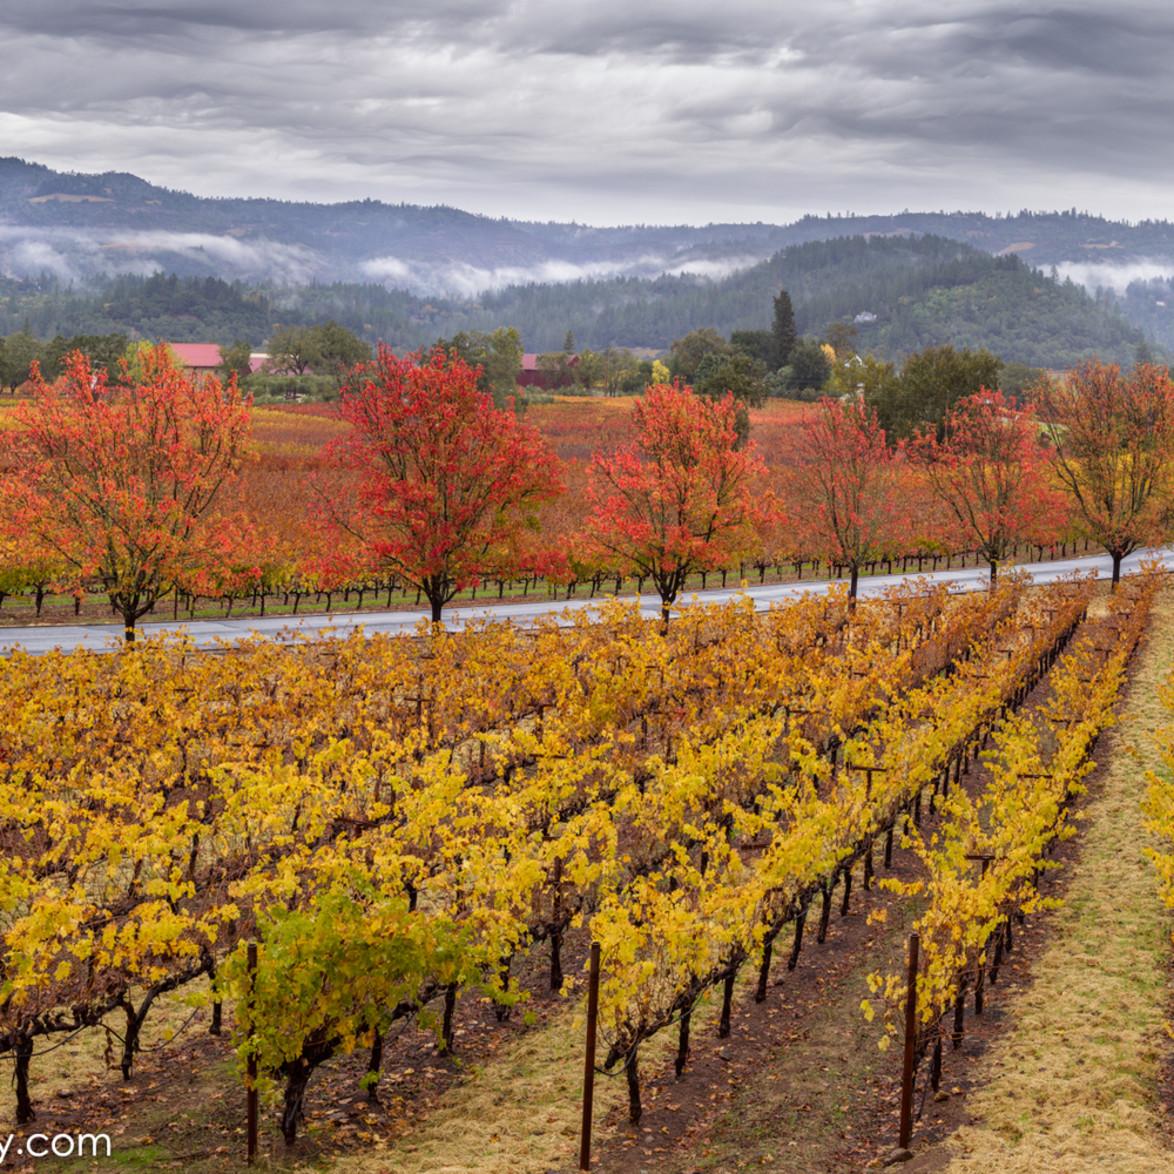 Trinchero autumn xiqgvu